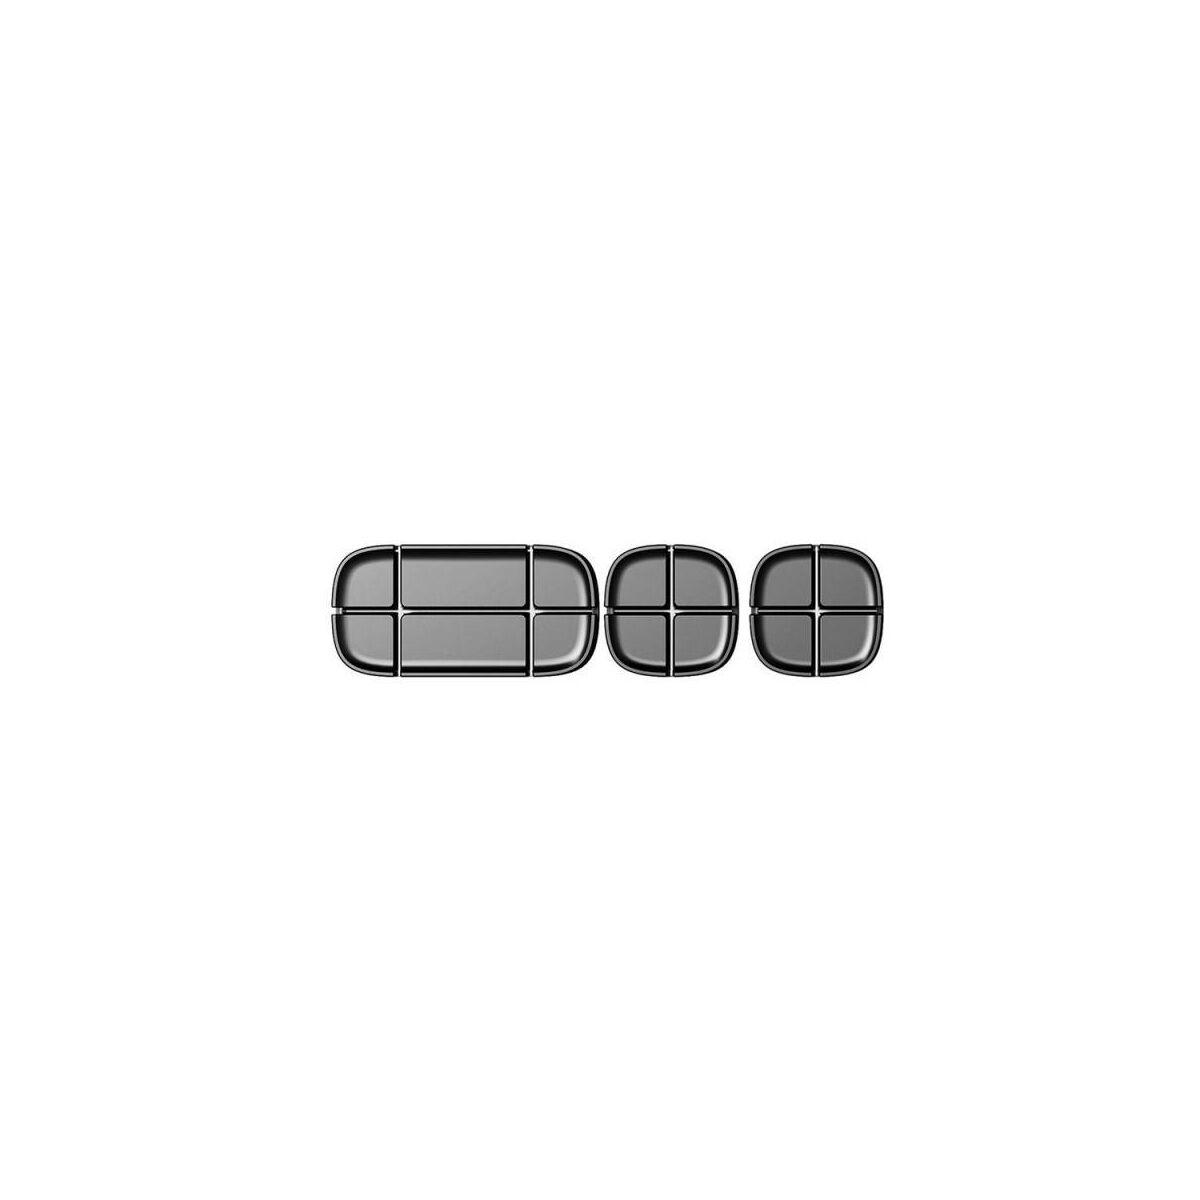 Baseus Cross Peas kábelrendező, fekete (ACTDJ-01)